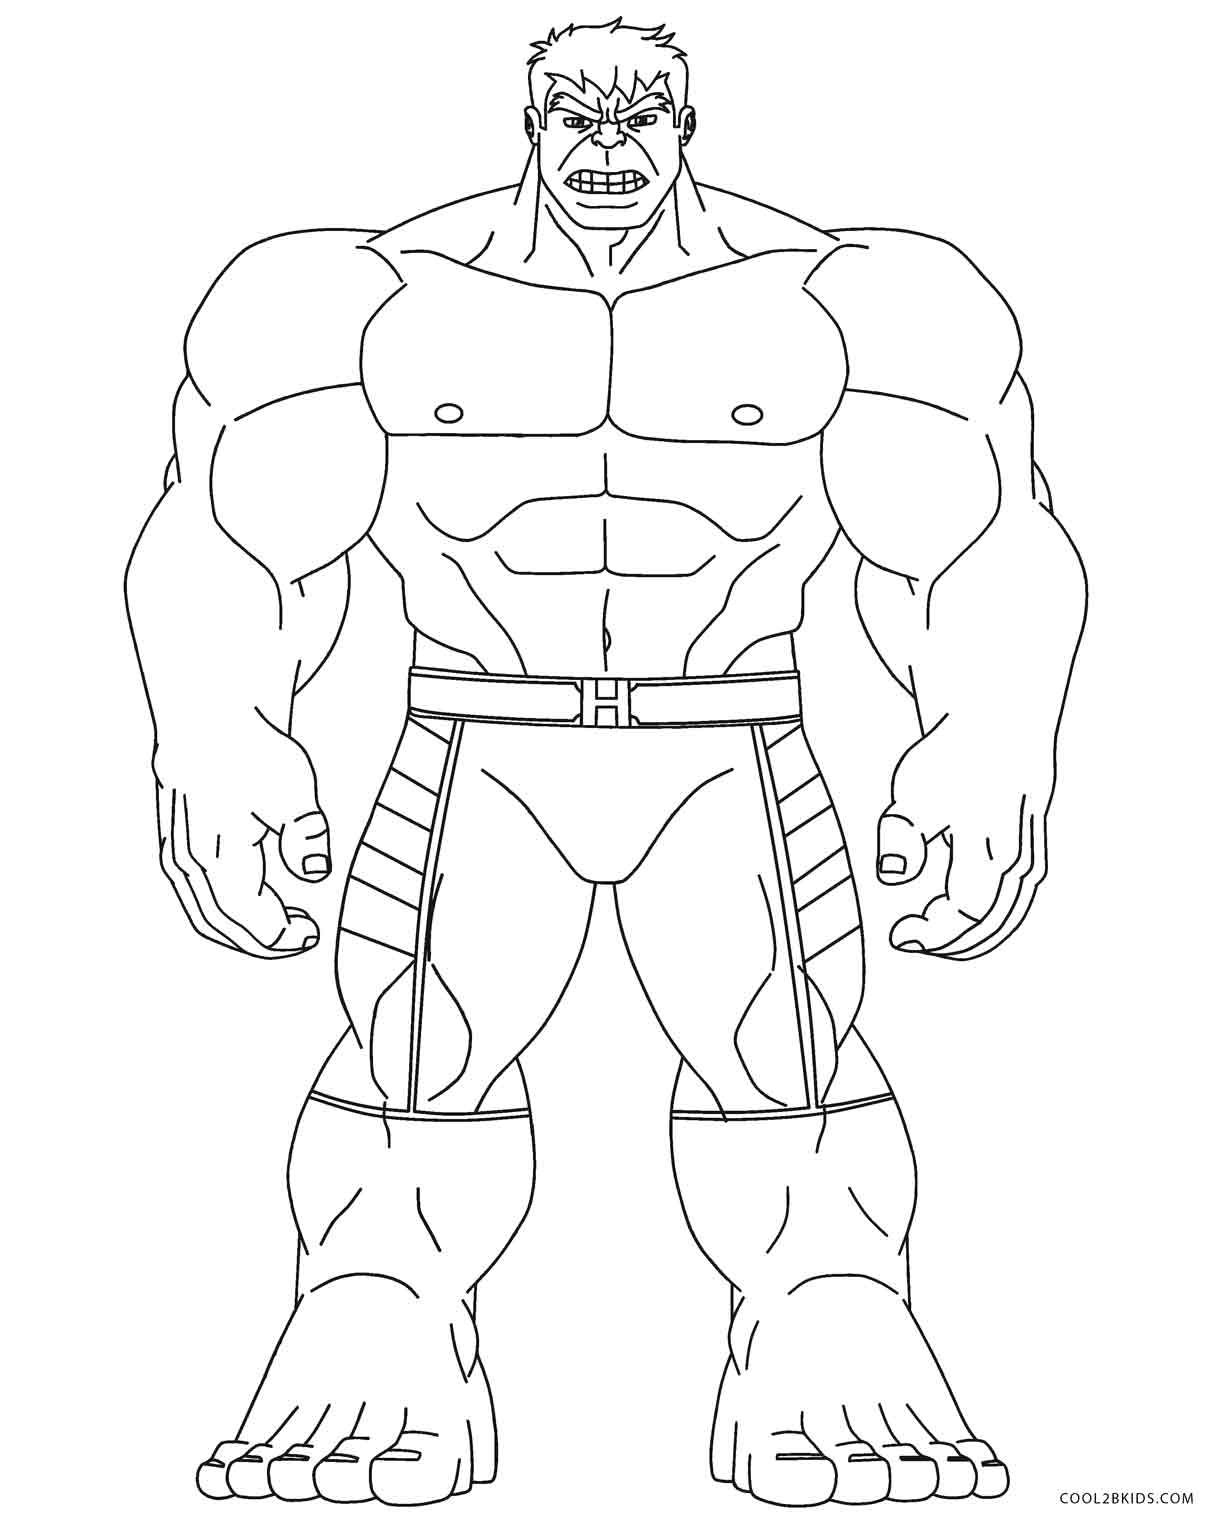 Incredible Hulk Printable Coloring Pages Hulk Coloring Pages Avengers Coloring Pages Marvel Coloring